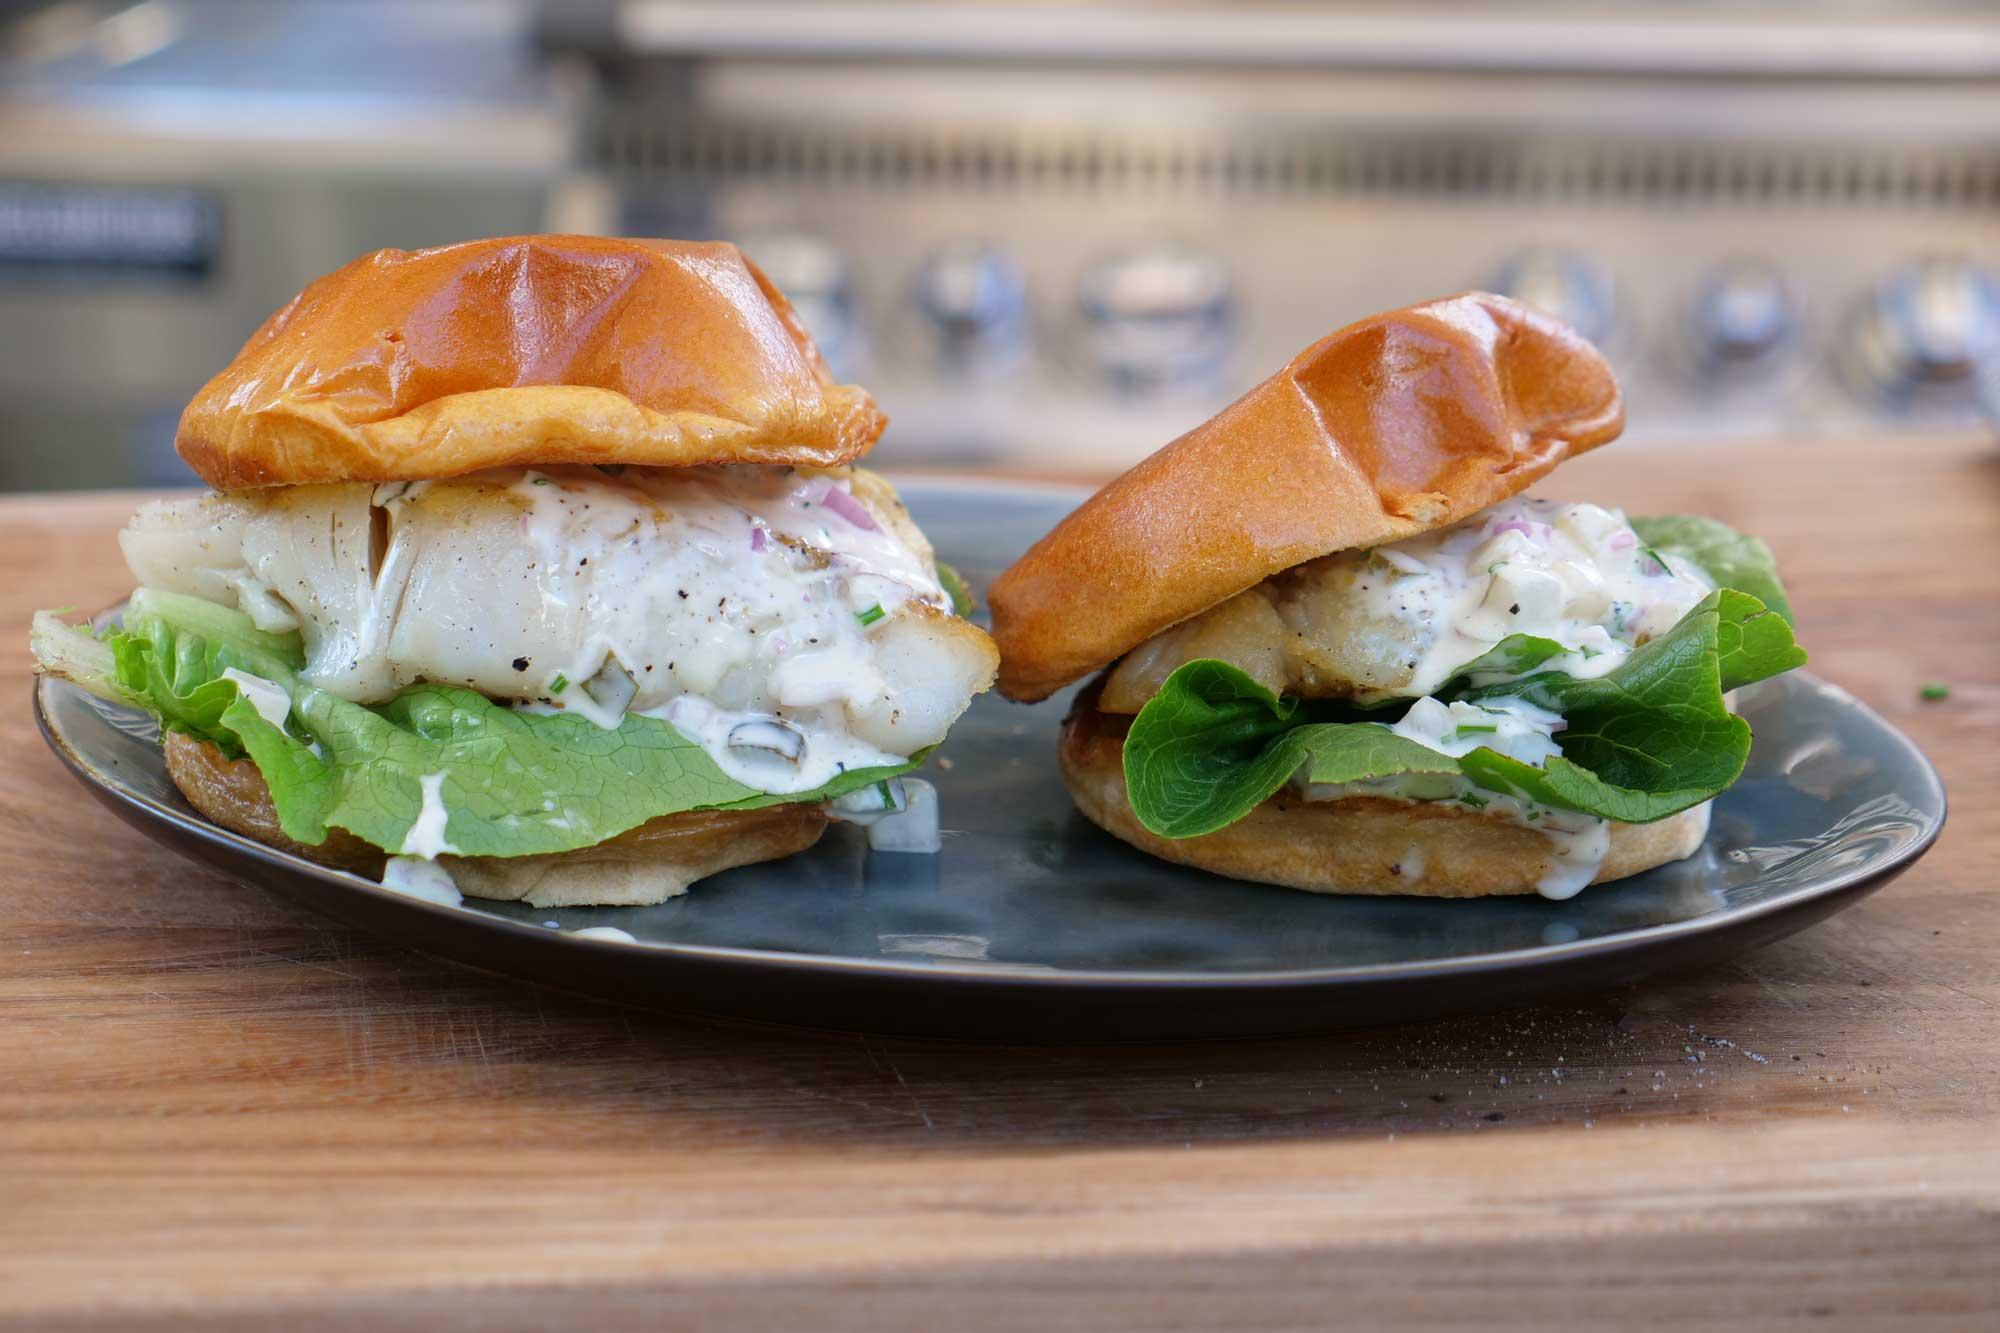 Leckerer Fischburger selbst gemacht – Einfaches Rezept zum Nachgrillen